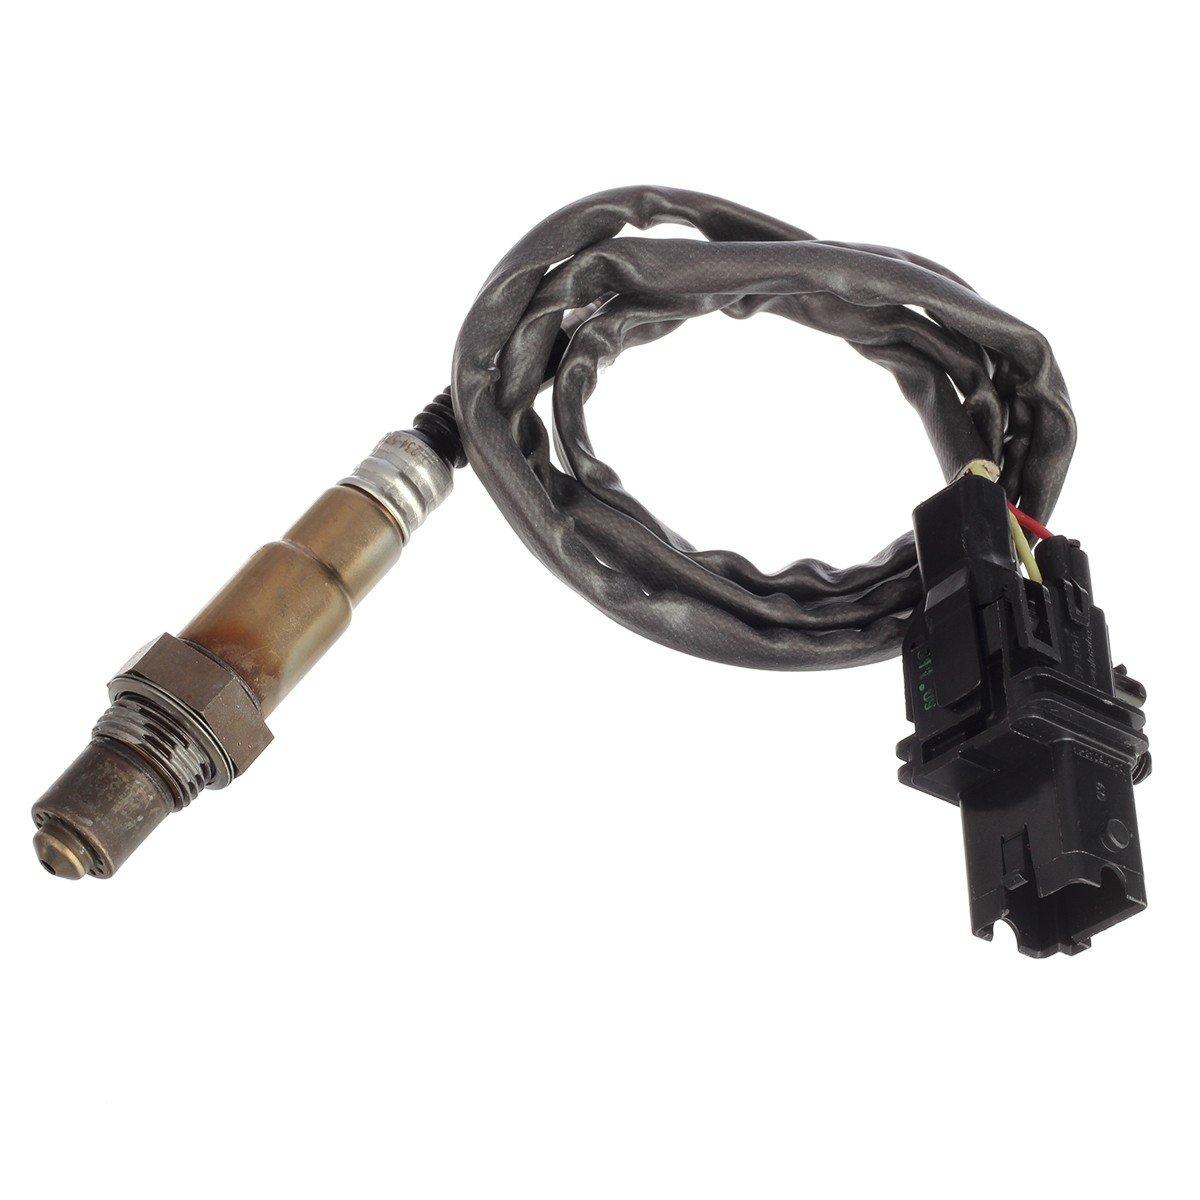 Air Fuel Ratio Sensor Afr 234 5703 Upstream O2 1 2001 Volvo S80 Oxygen Location For 2002 2005 L6 29l Leftfor 2003 Xc90